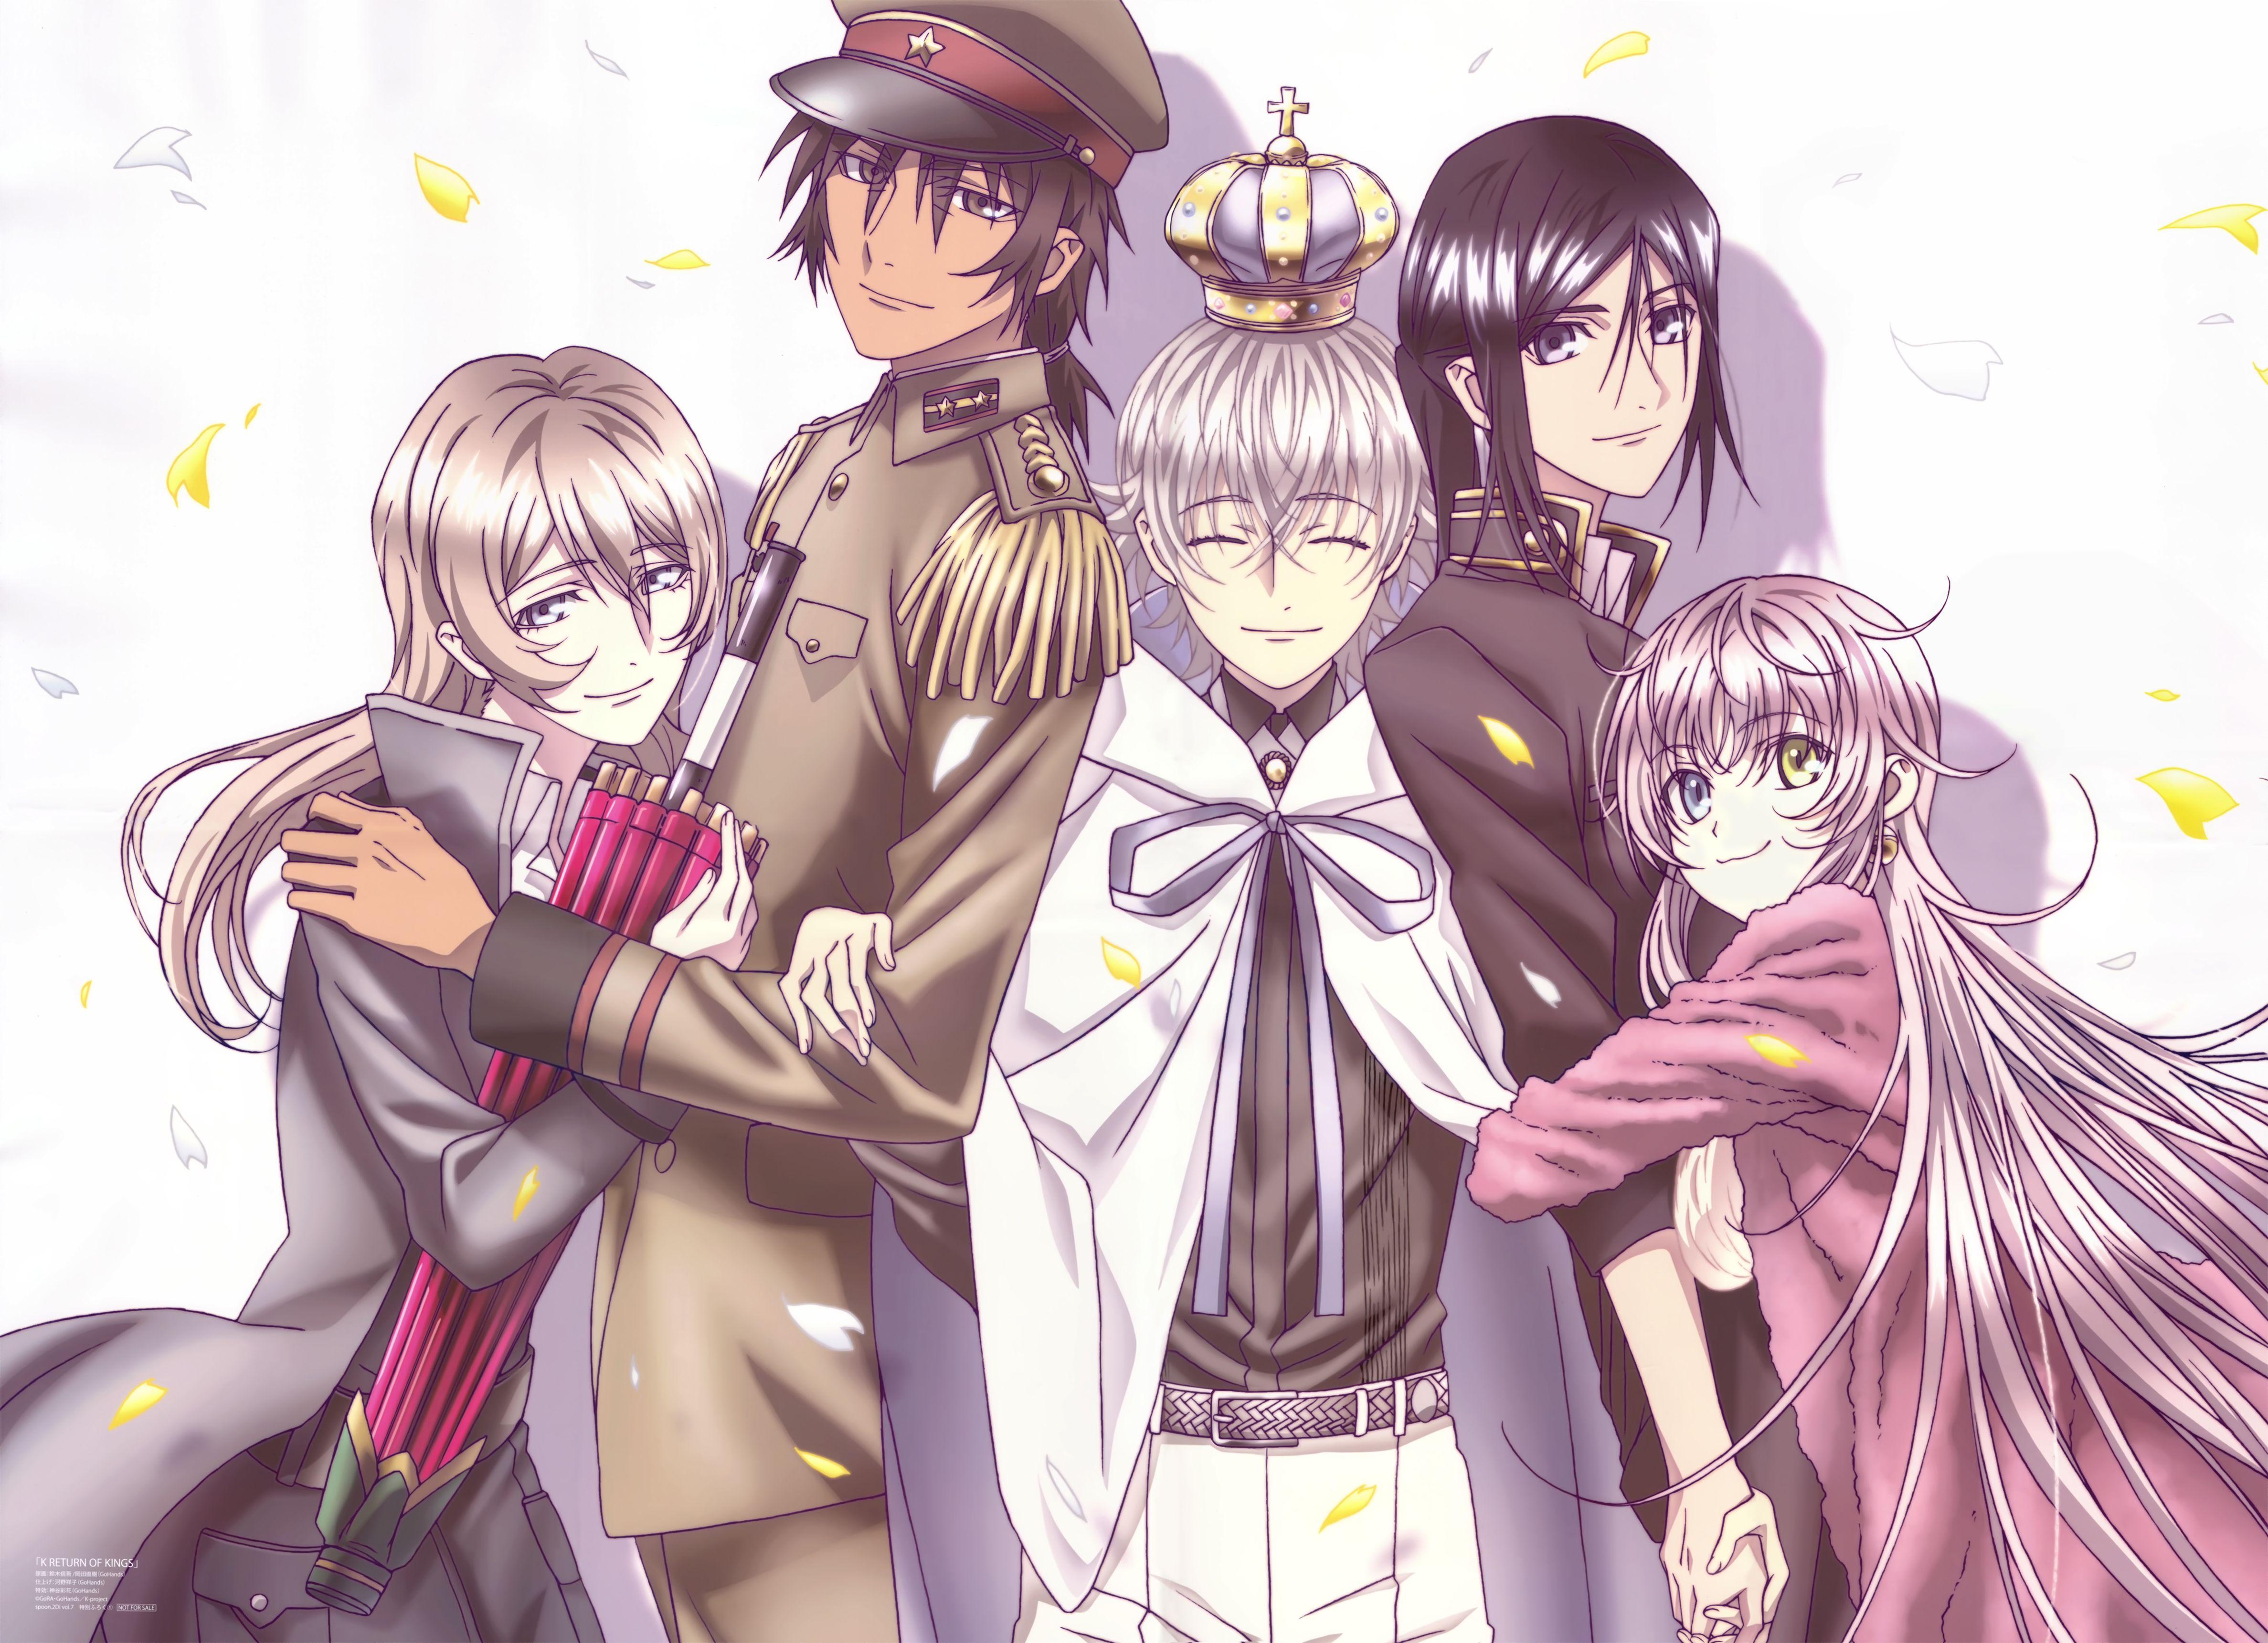 Buy athah anime k project kuroh yatogami neko yashiro isana adolf k. Download K Project (4750x3442) | K project anime, K ...